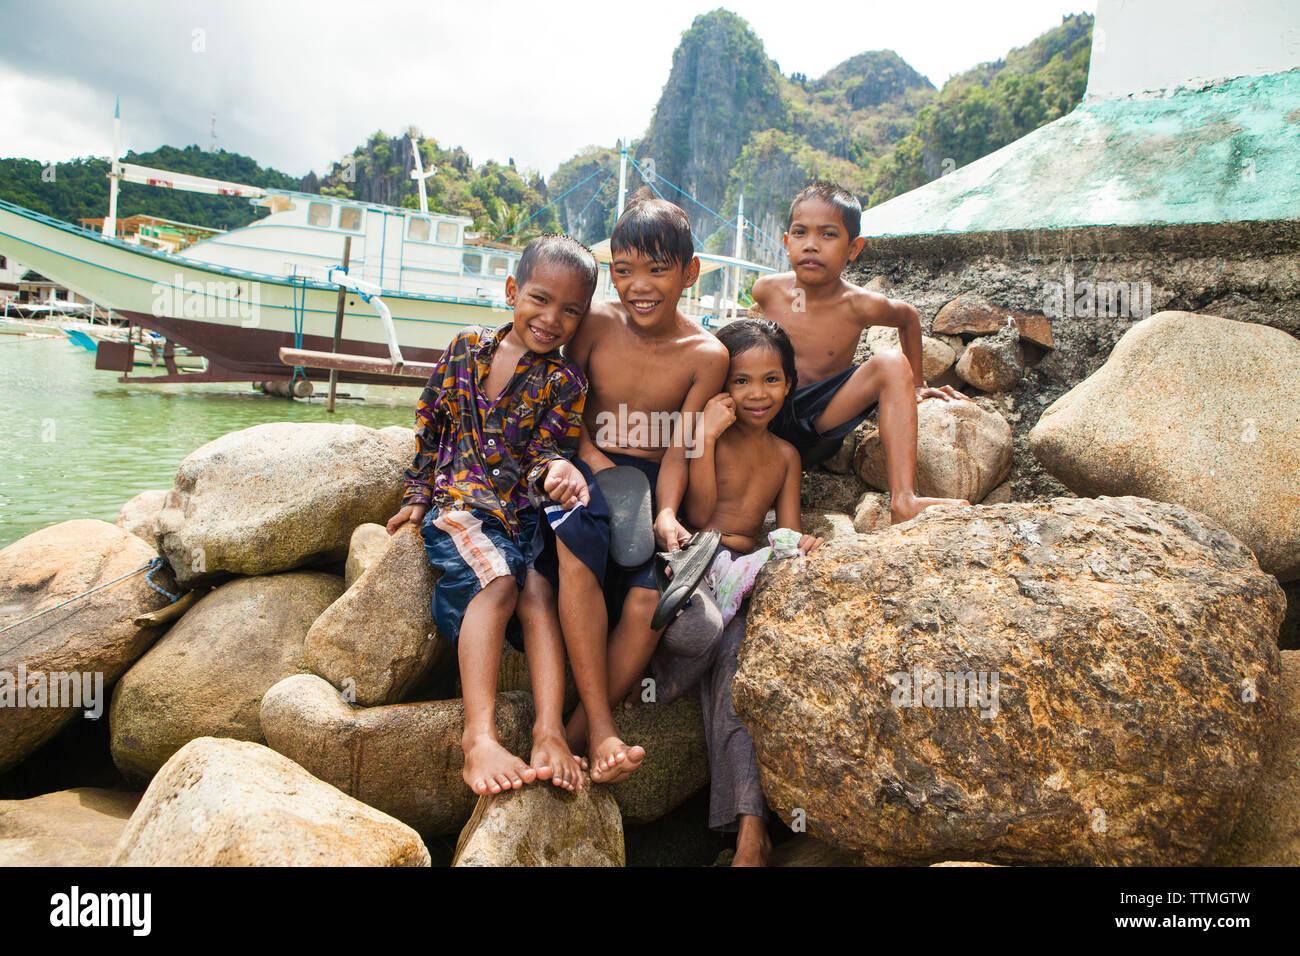 PHILIPPINES, Palawan, El Nido, kids play at a beach in the town of El Nido in the South China Sea - Stock Image